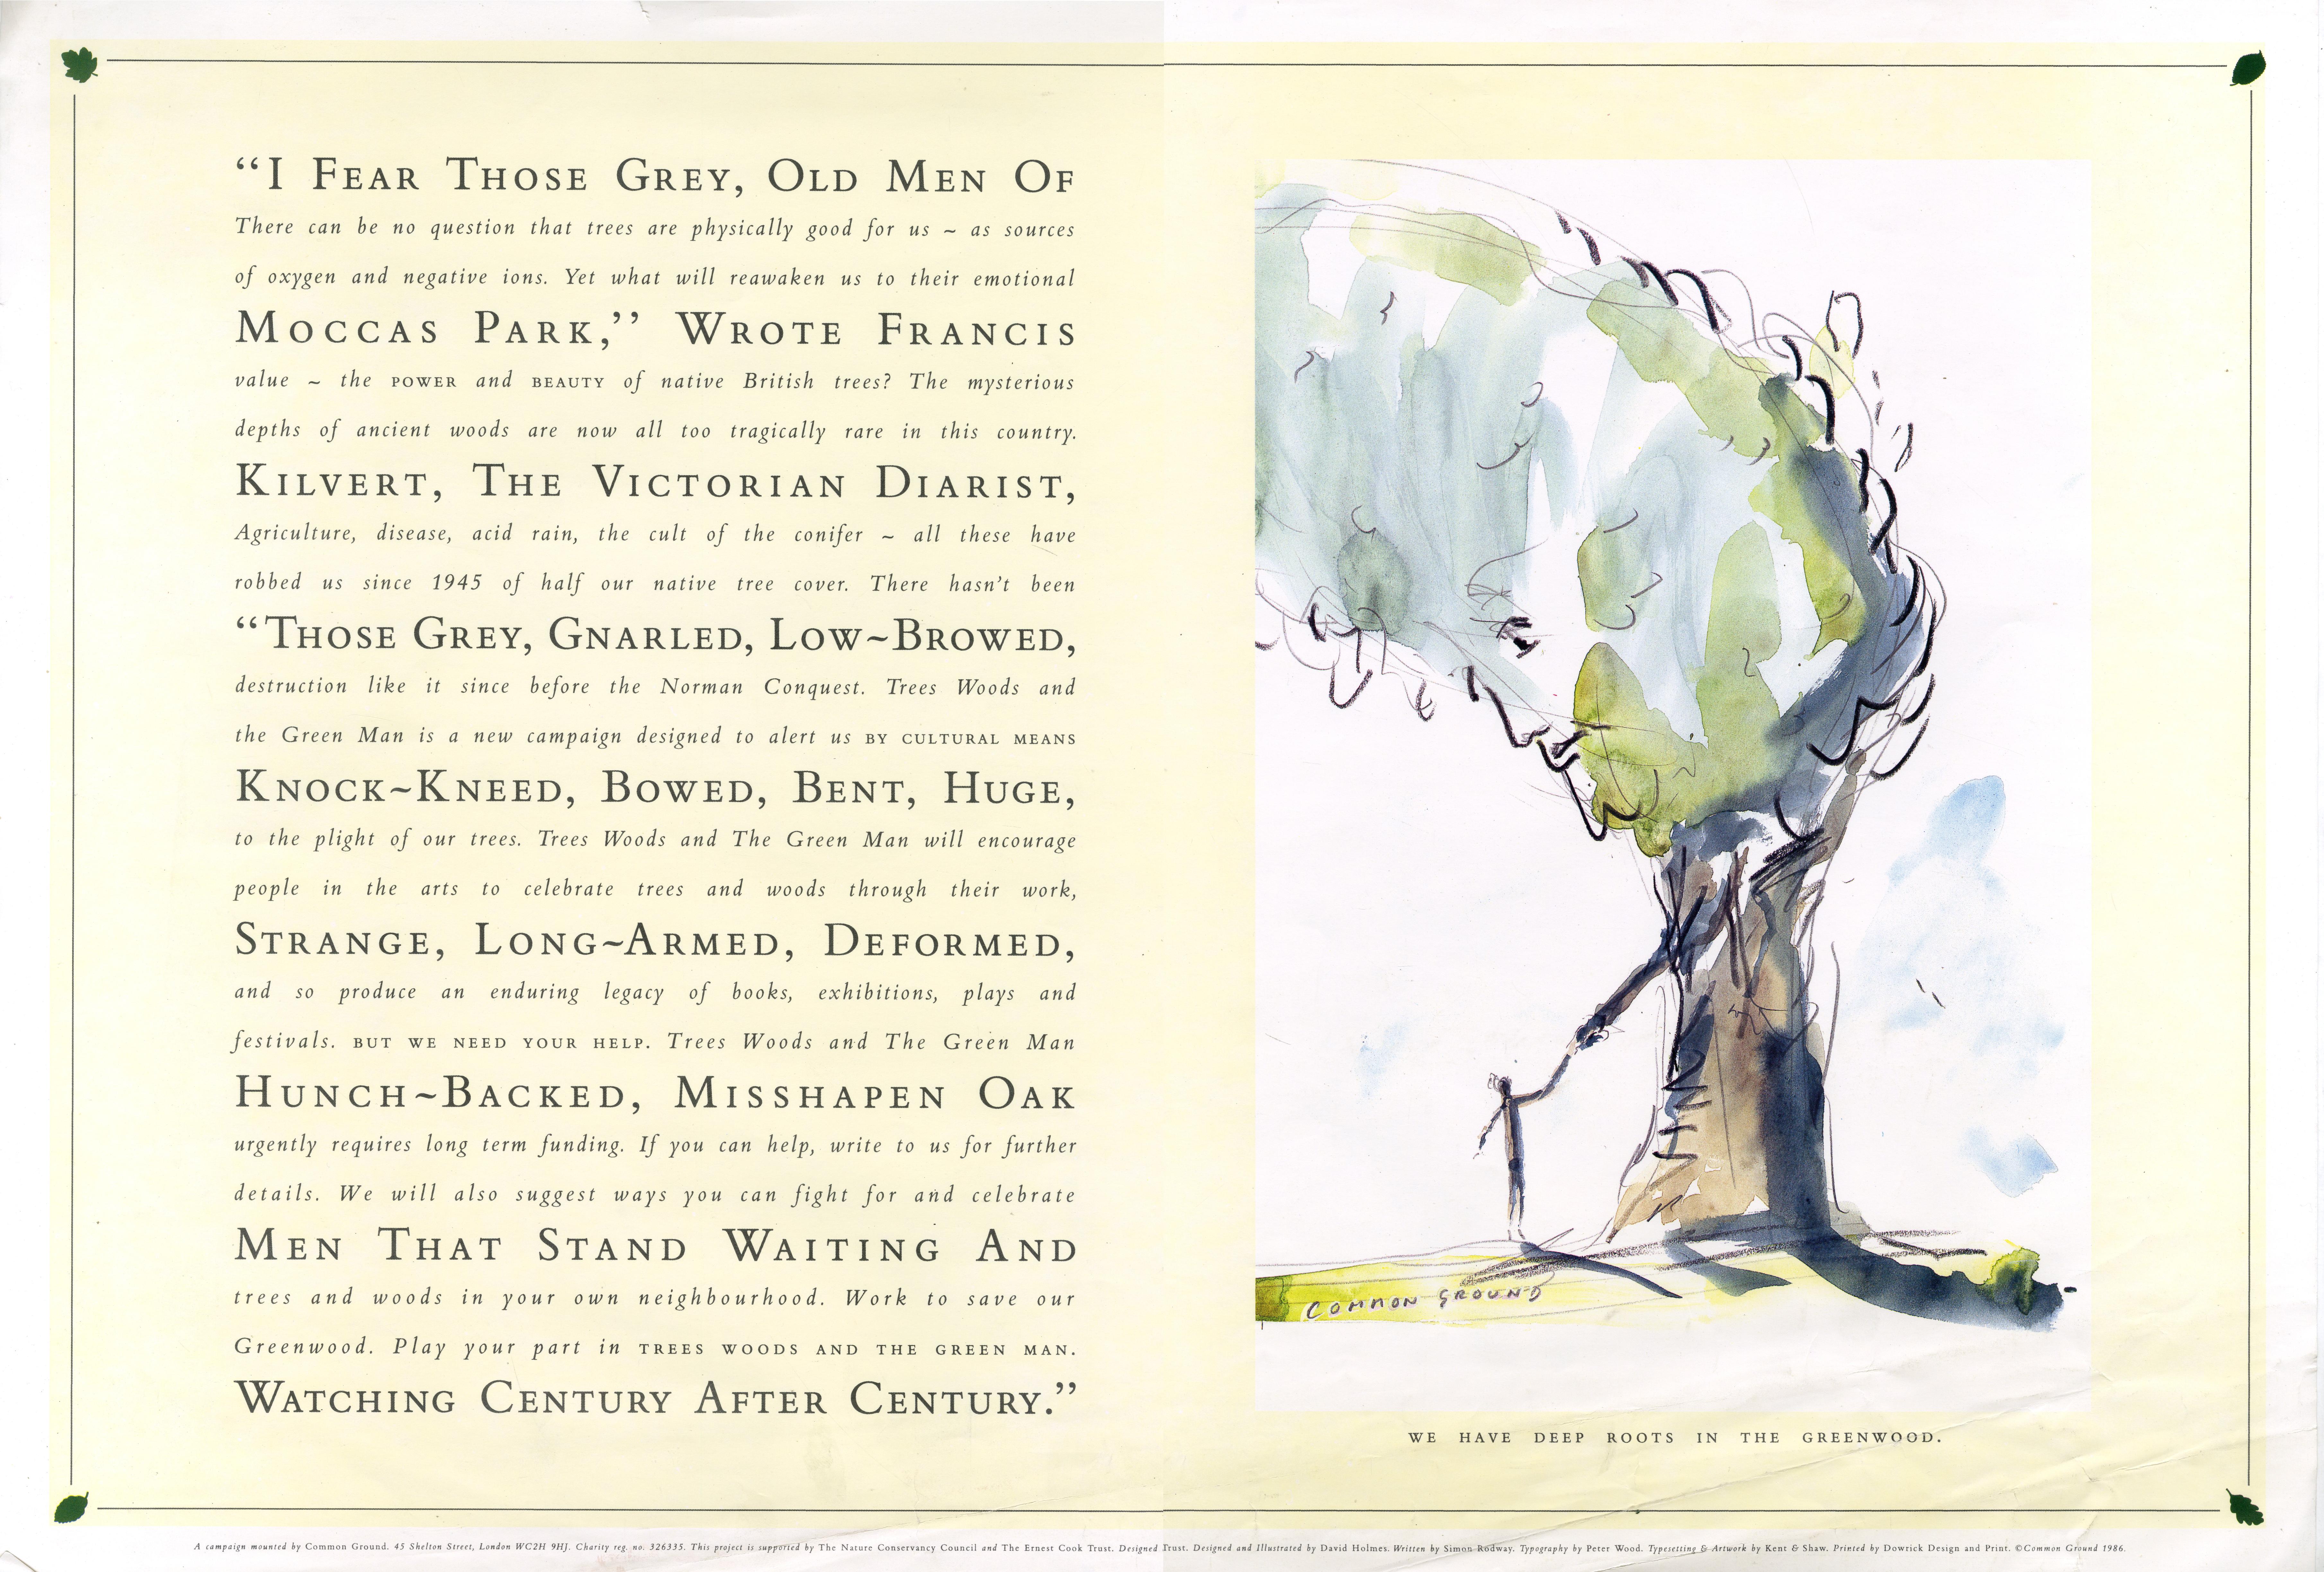 Common Ground 'Tree',  Holmes, HKR-01